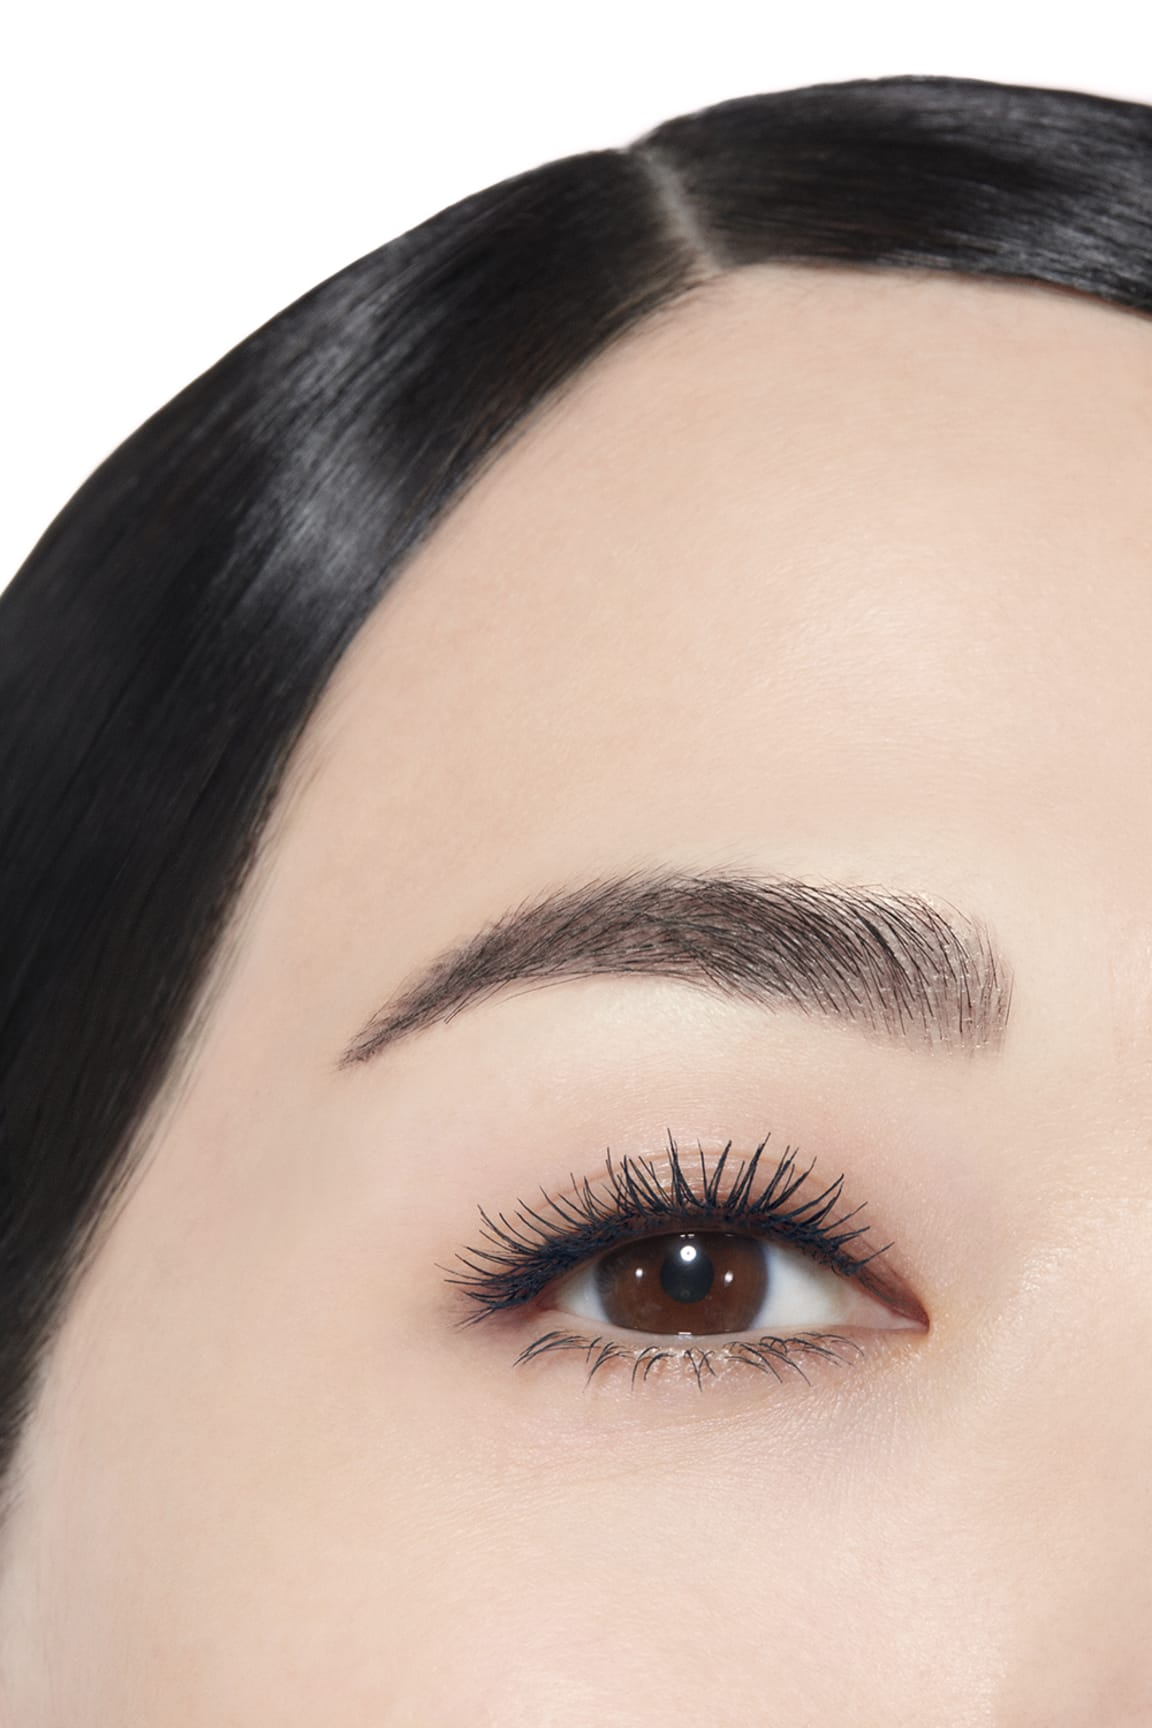 Application makeup visual 1 - LE VOLUME DE CHANEL 70 - BLUE NIGHT